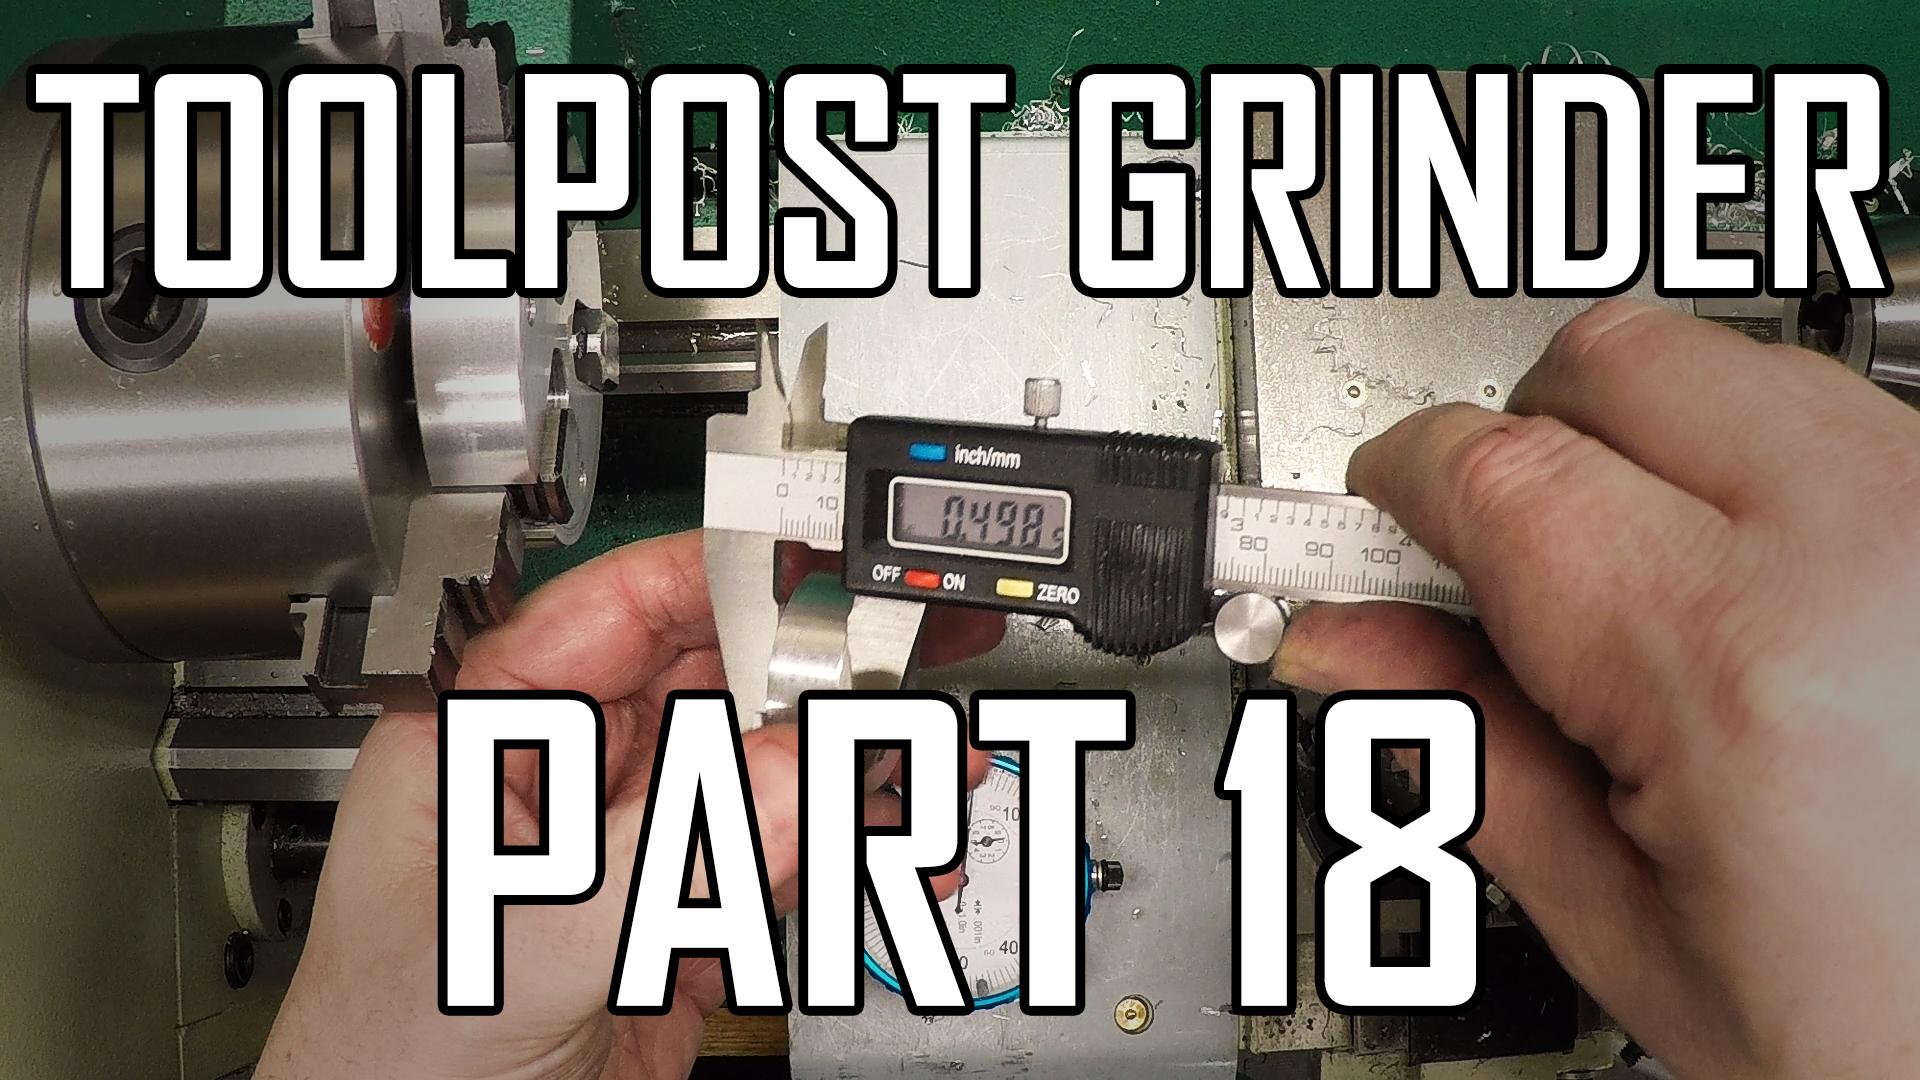 Toolpost Grinder Part 18: Wheel Arbor 1